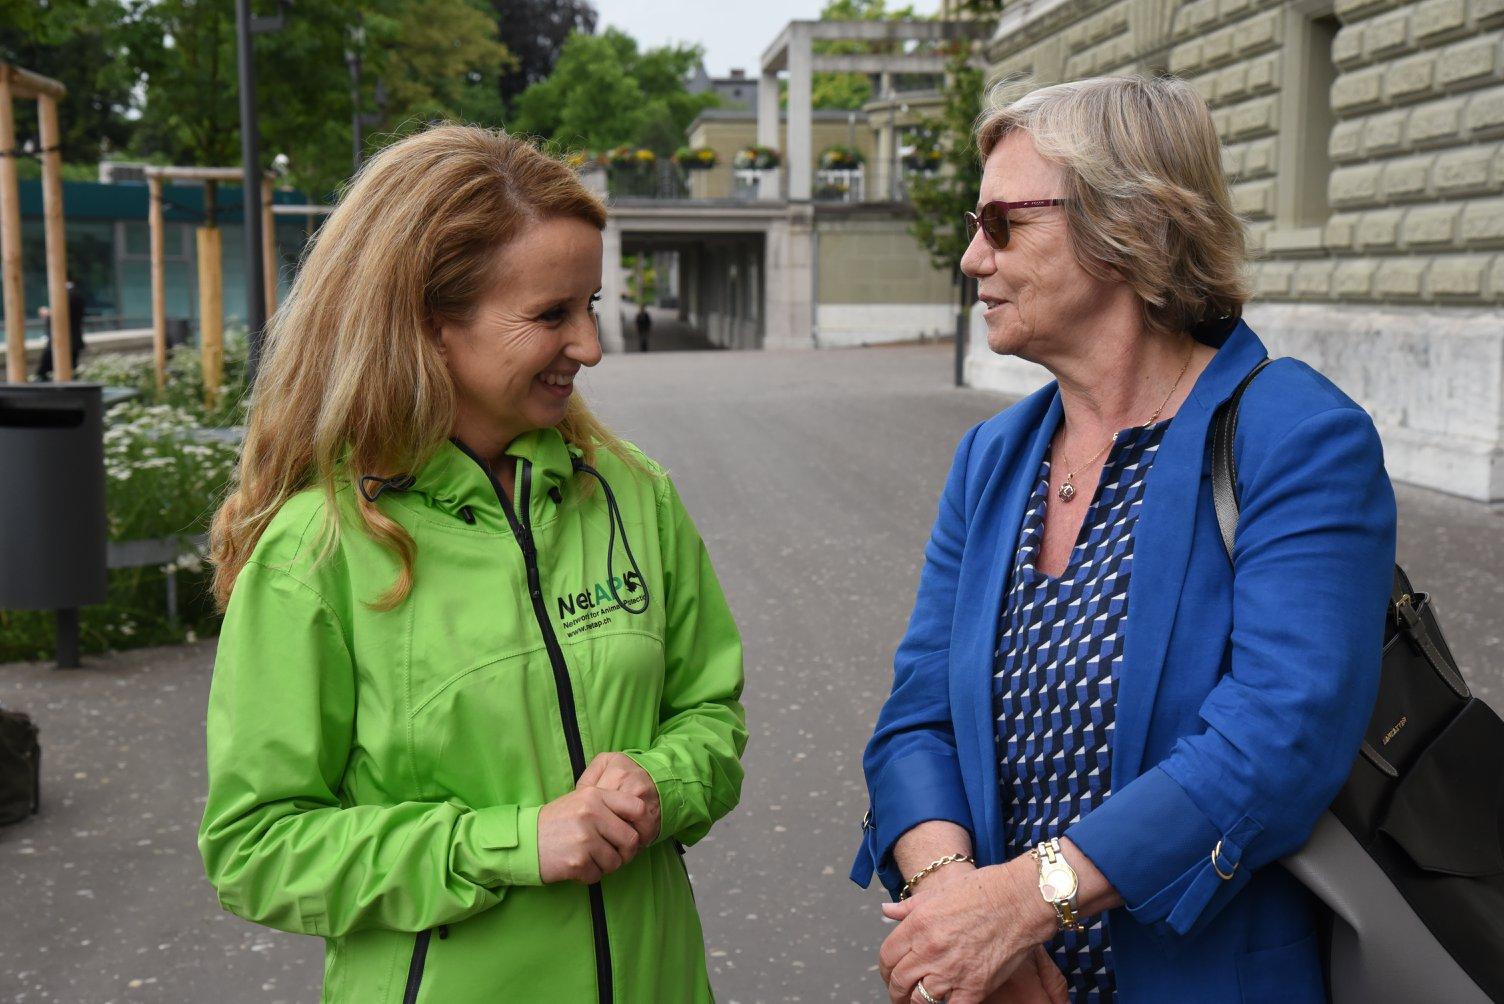 Présidente de NetAPP, Ester Geisser et Prominente Unterstützerin aus dem Parlament: Laurance Fehlmann Rielle, Nationalrätin SP GE